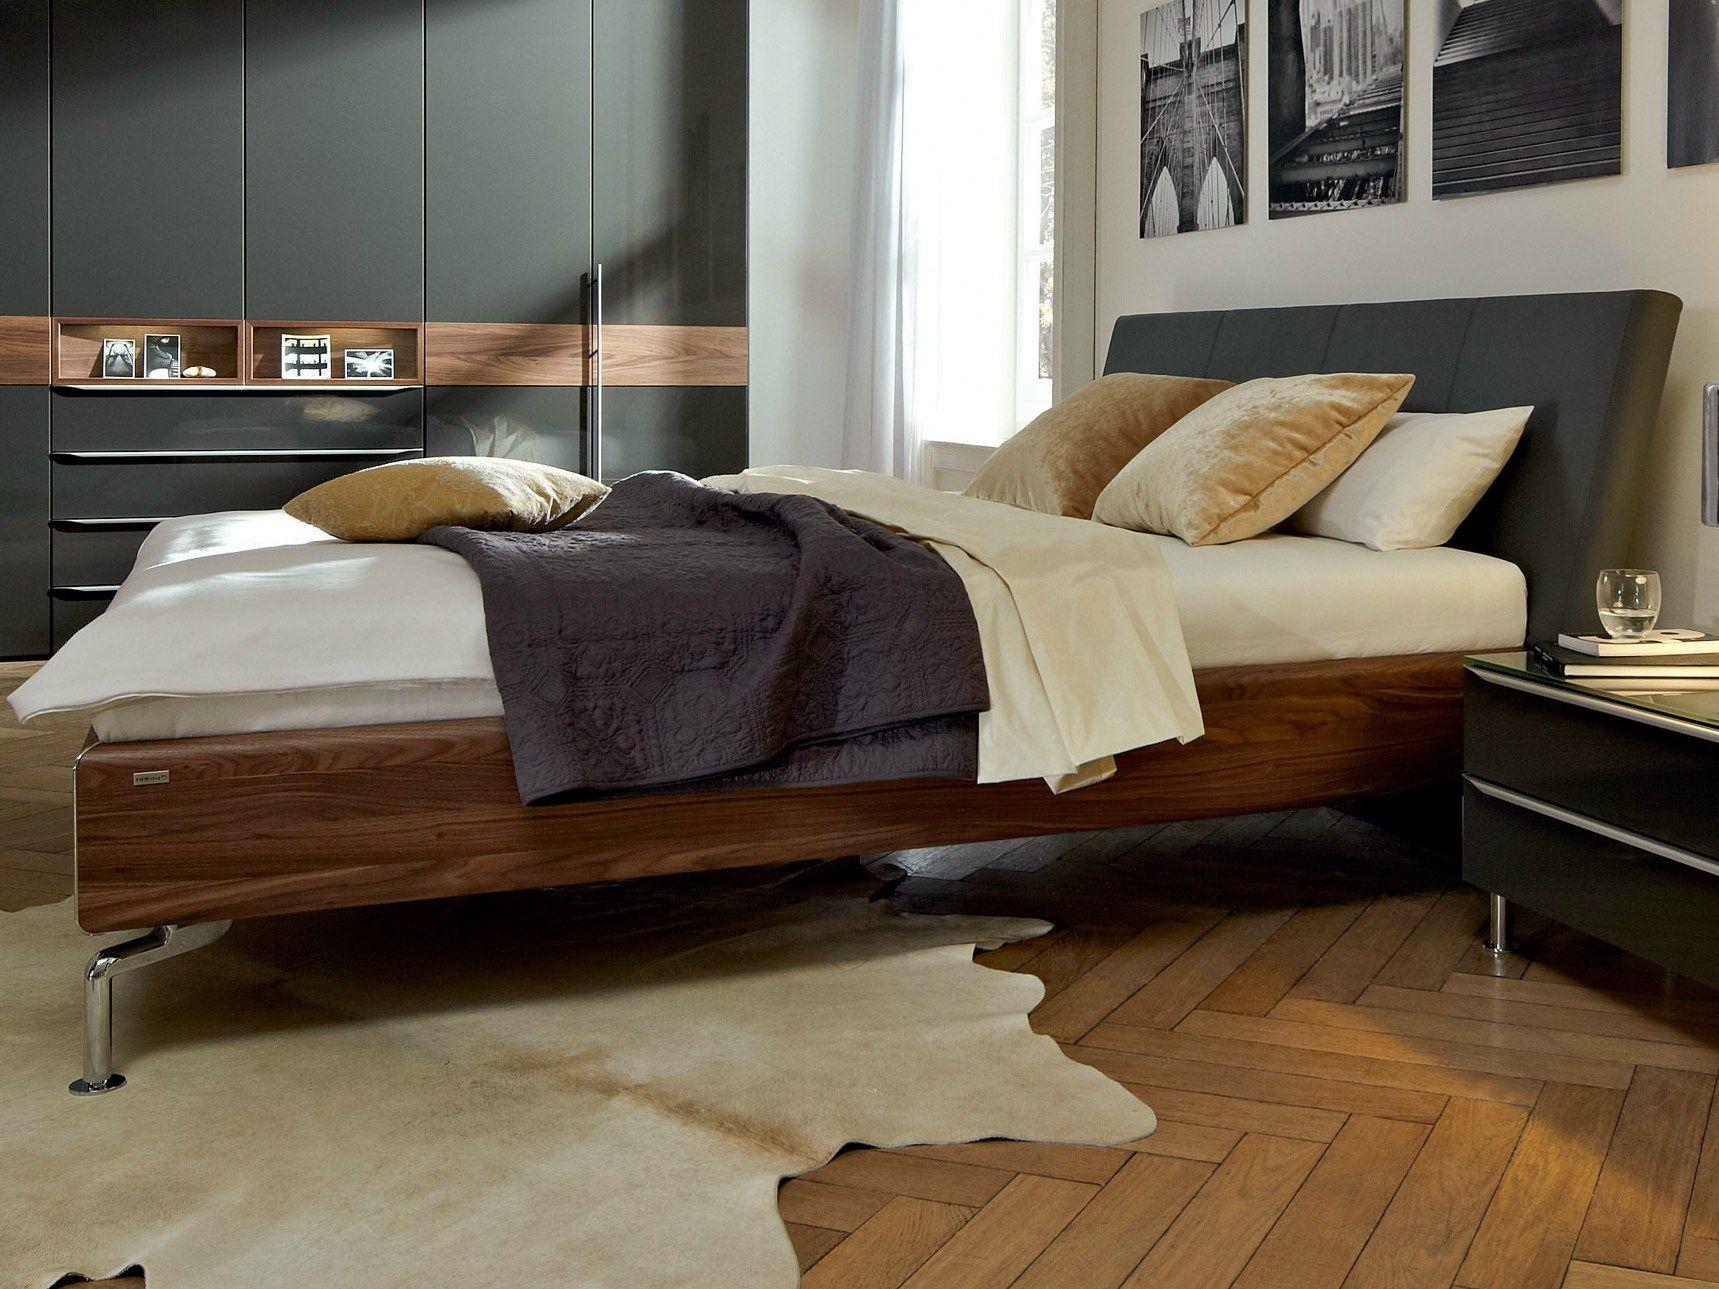 Hülster Bett besteld hulsta metis plus bed kast en nachttafels zand